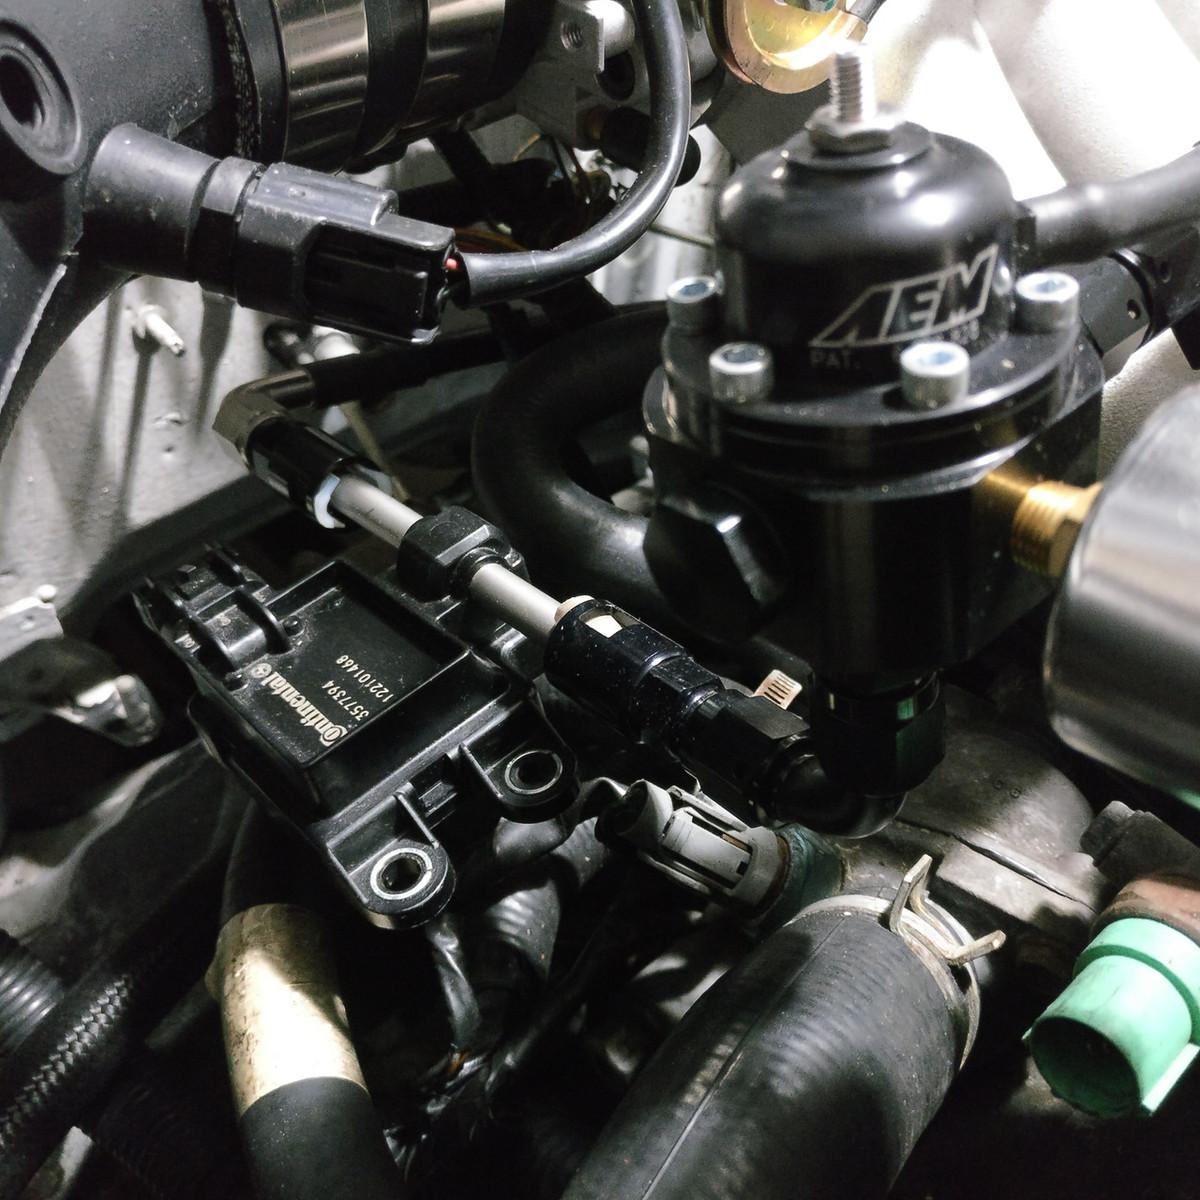 Jbtuned Flex Fuel E85 System Conversion Civic Integra B D Racing Filter Install Series